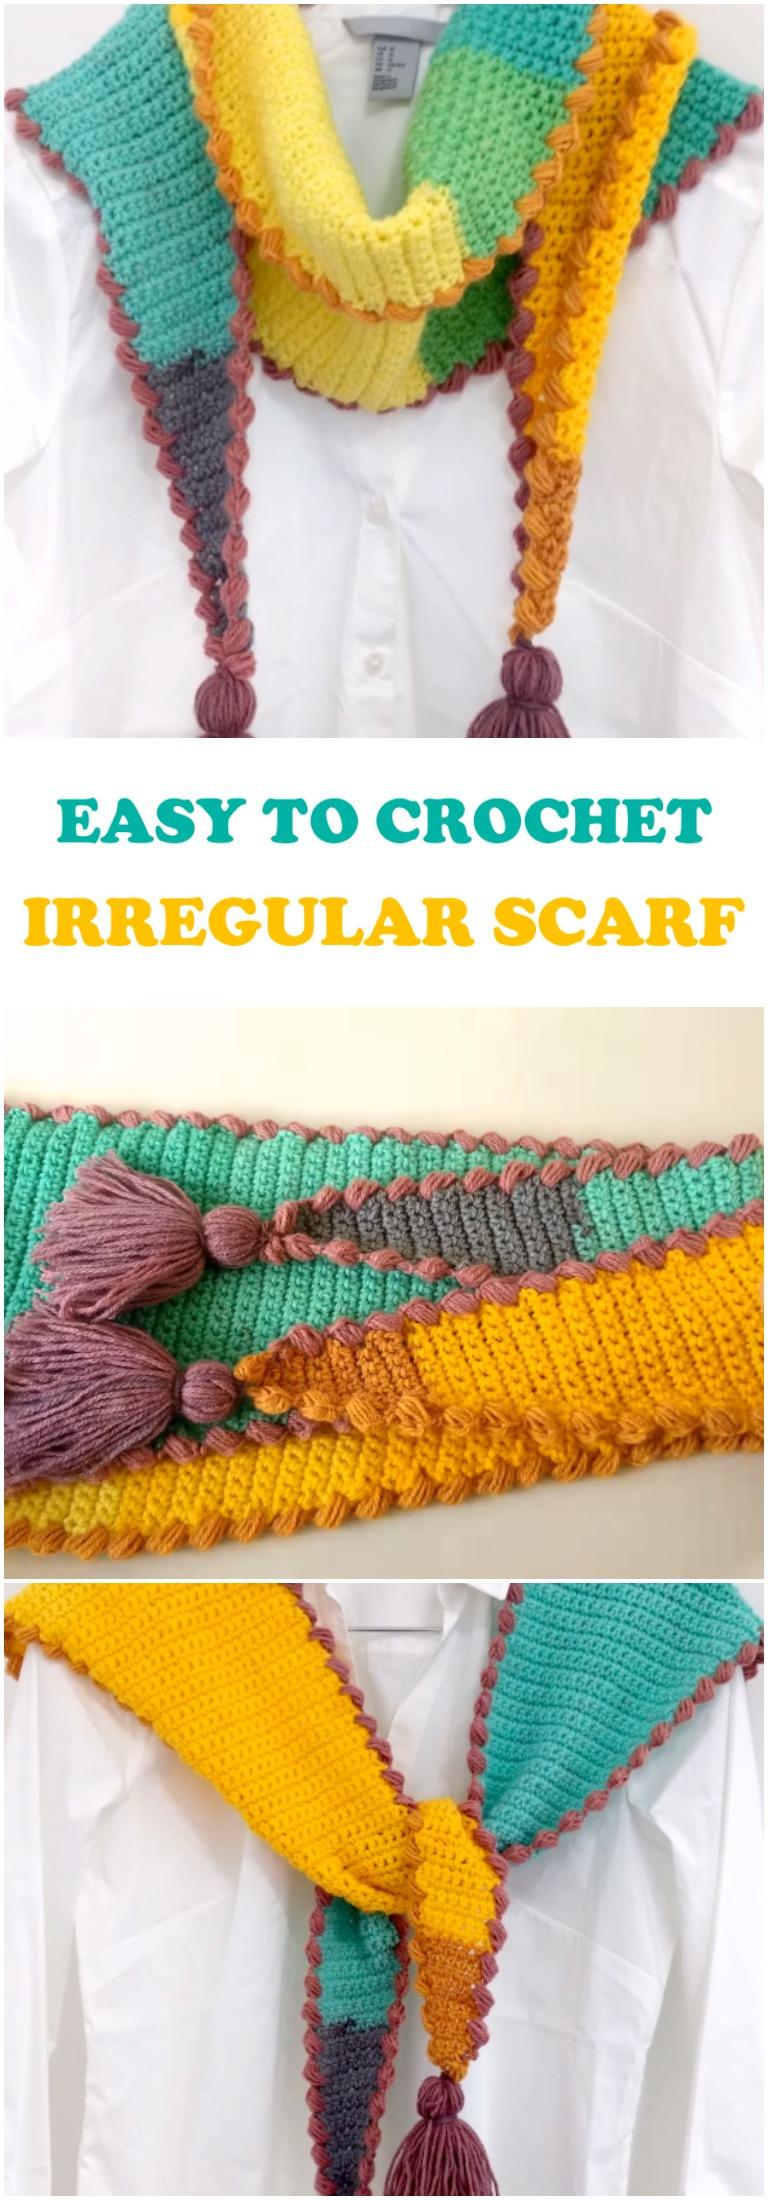 Easy To Crochet Irregular Scarf